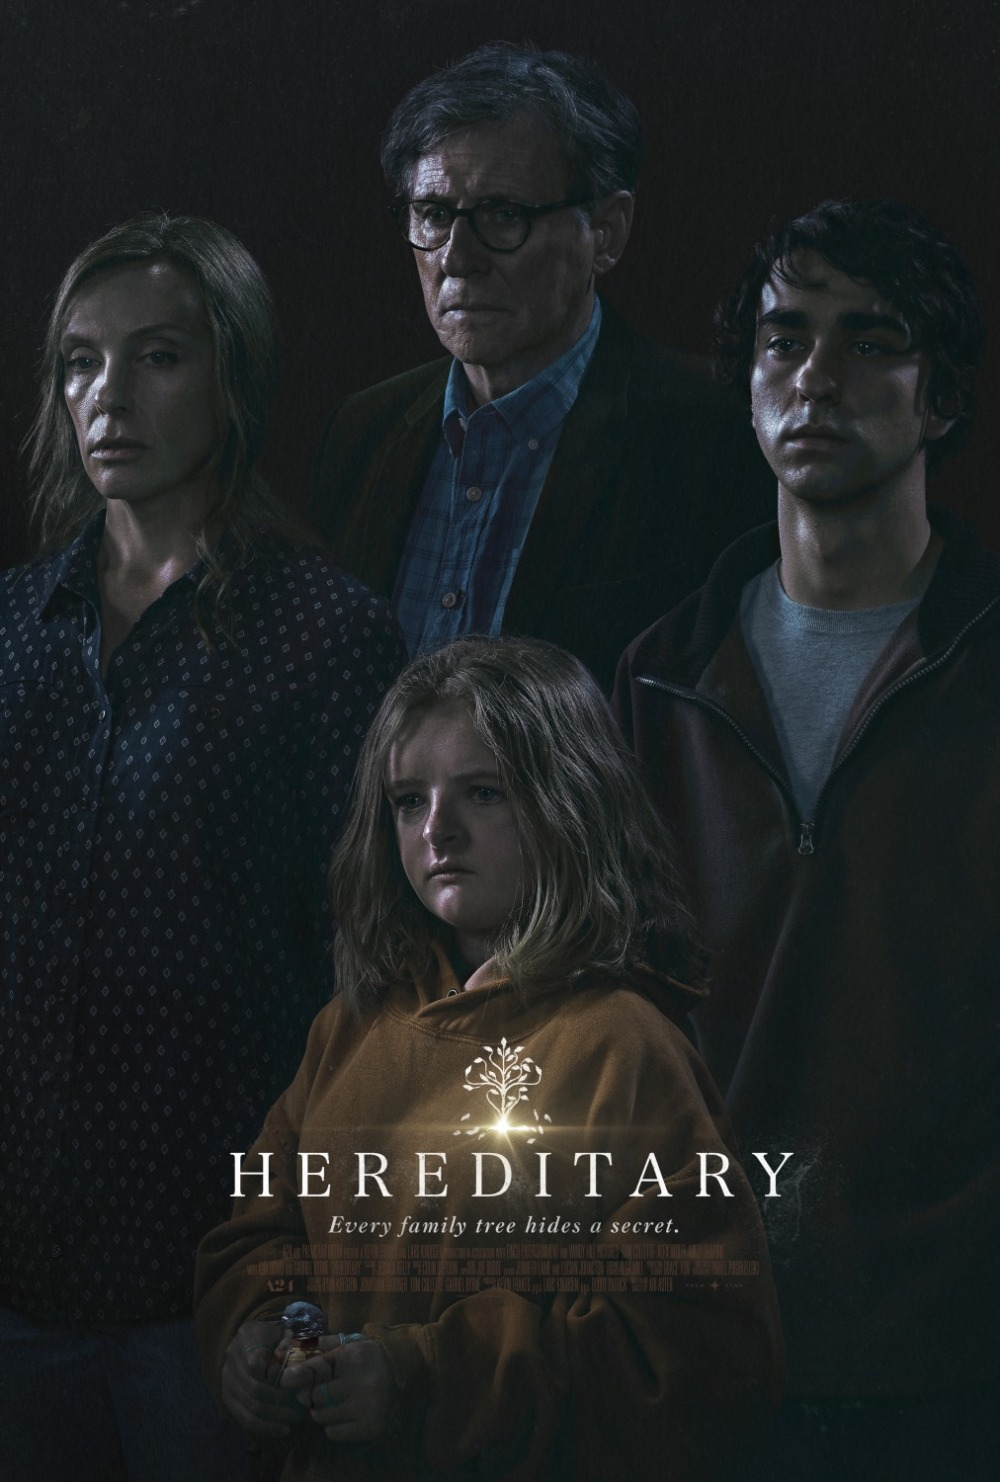 hereditary_ver2_xlg